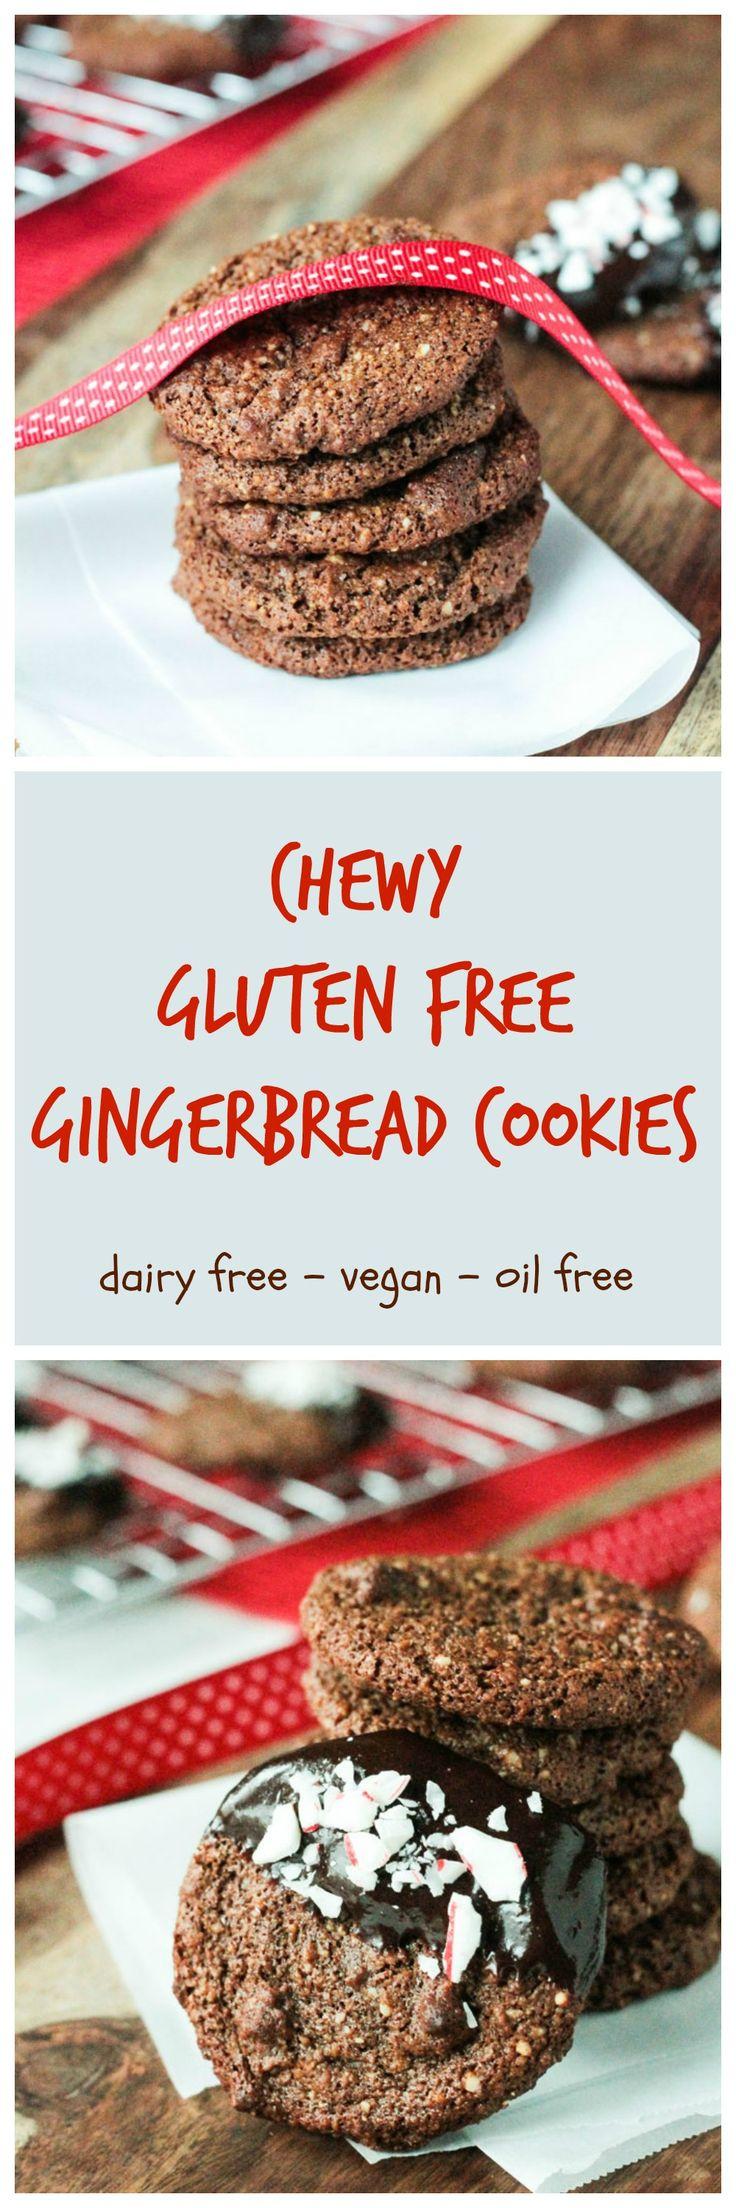 ... Vegan treats, Vegan gingerbread cookies and Gluten free gingerbread